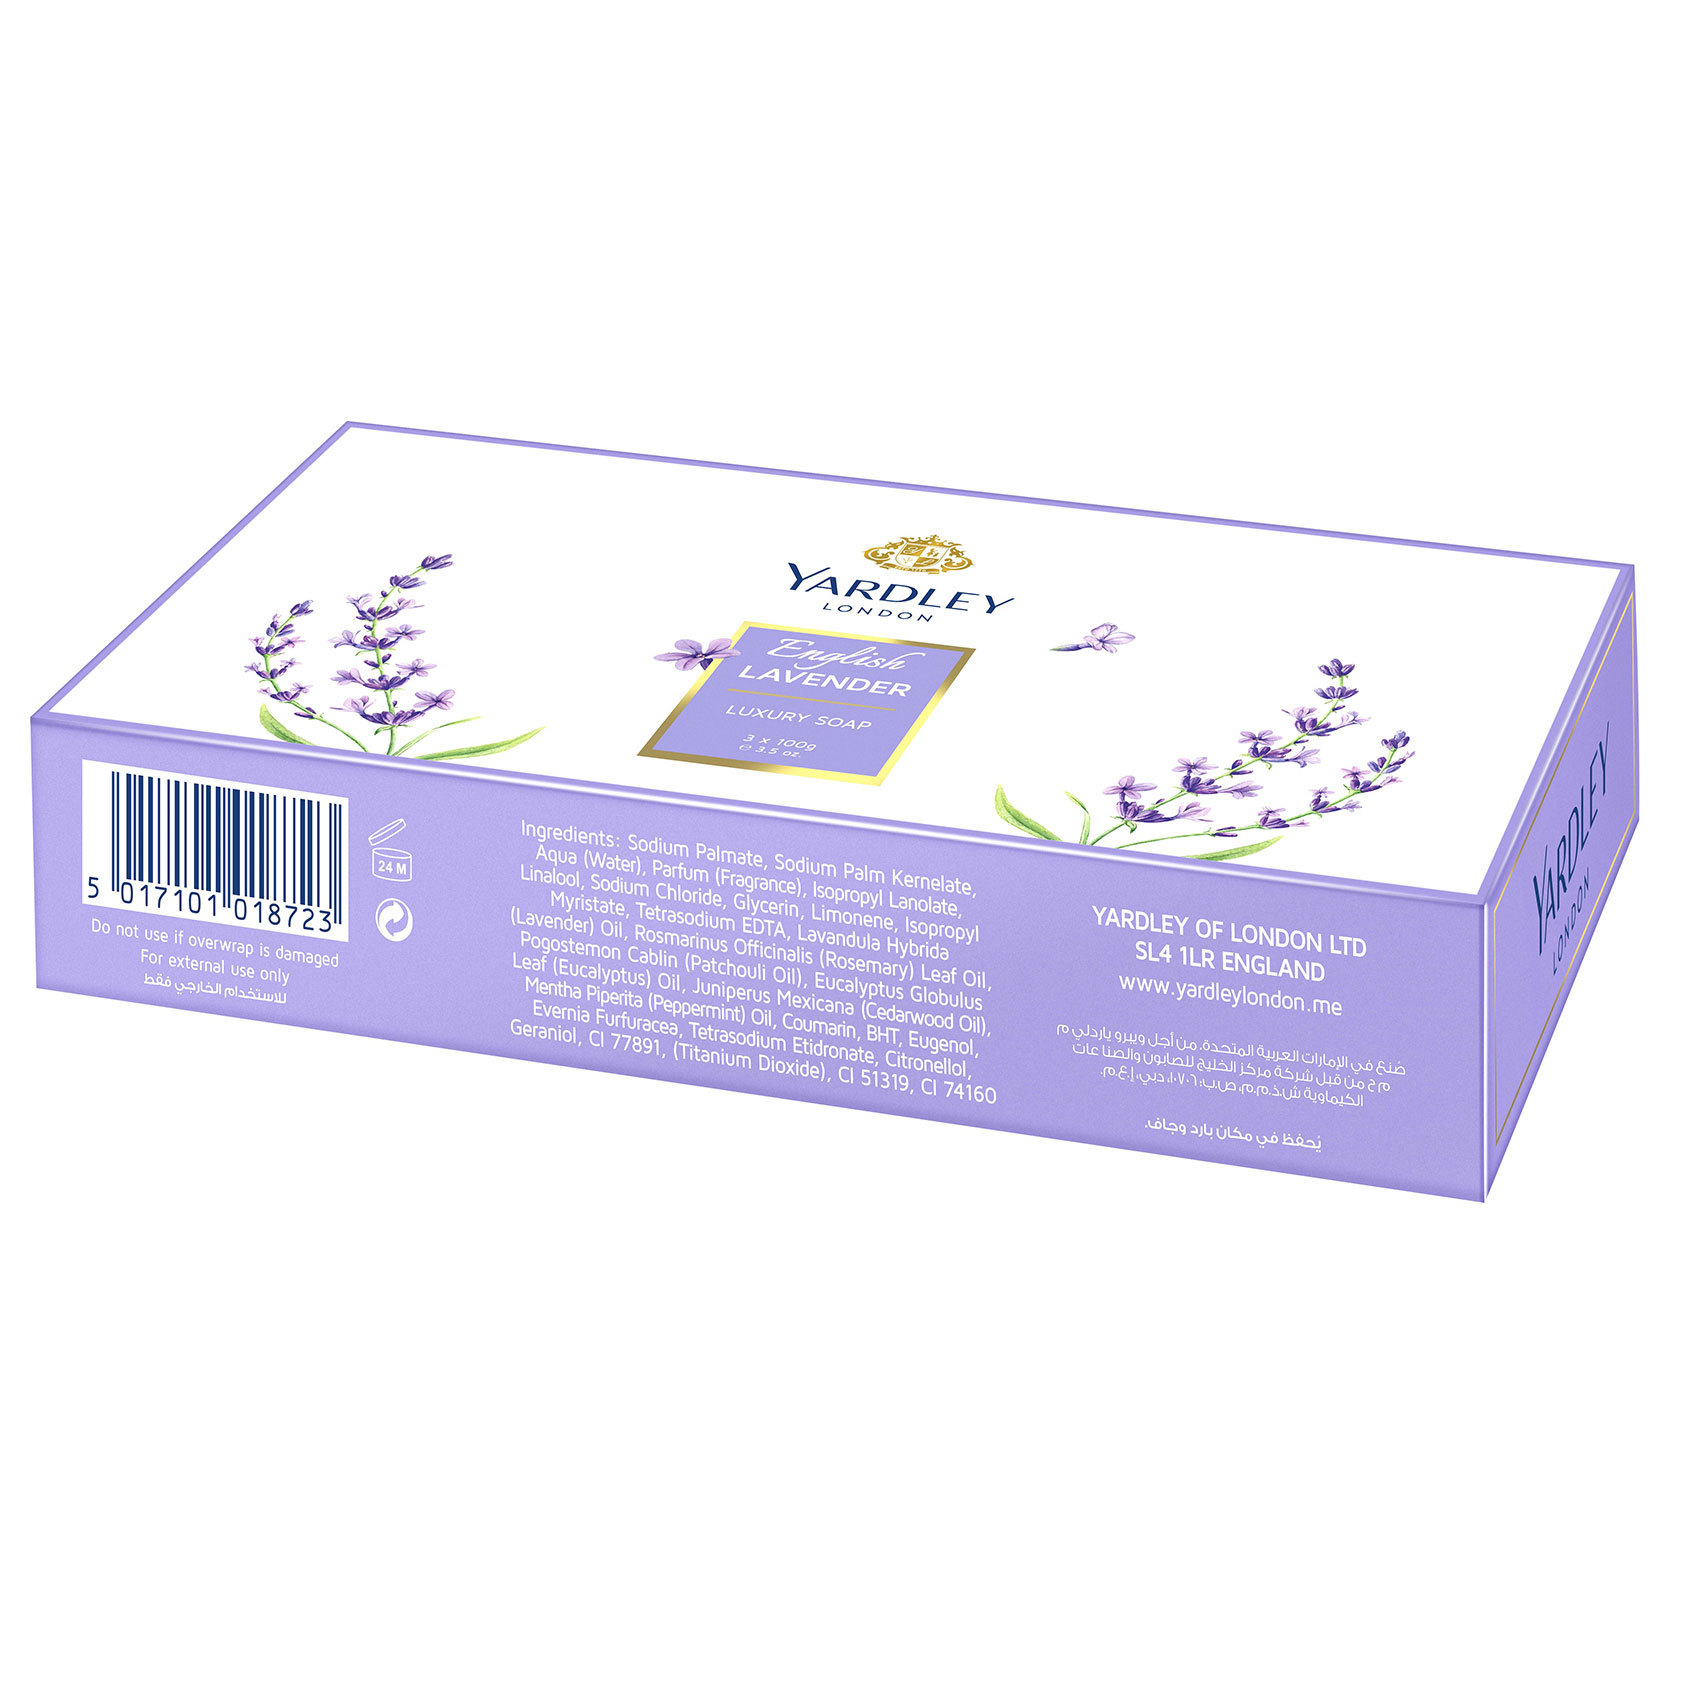 YARDLEY SOAP ENGLISH LAVNDER 100GX3